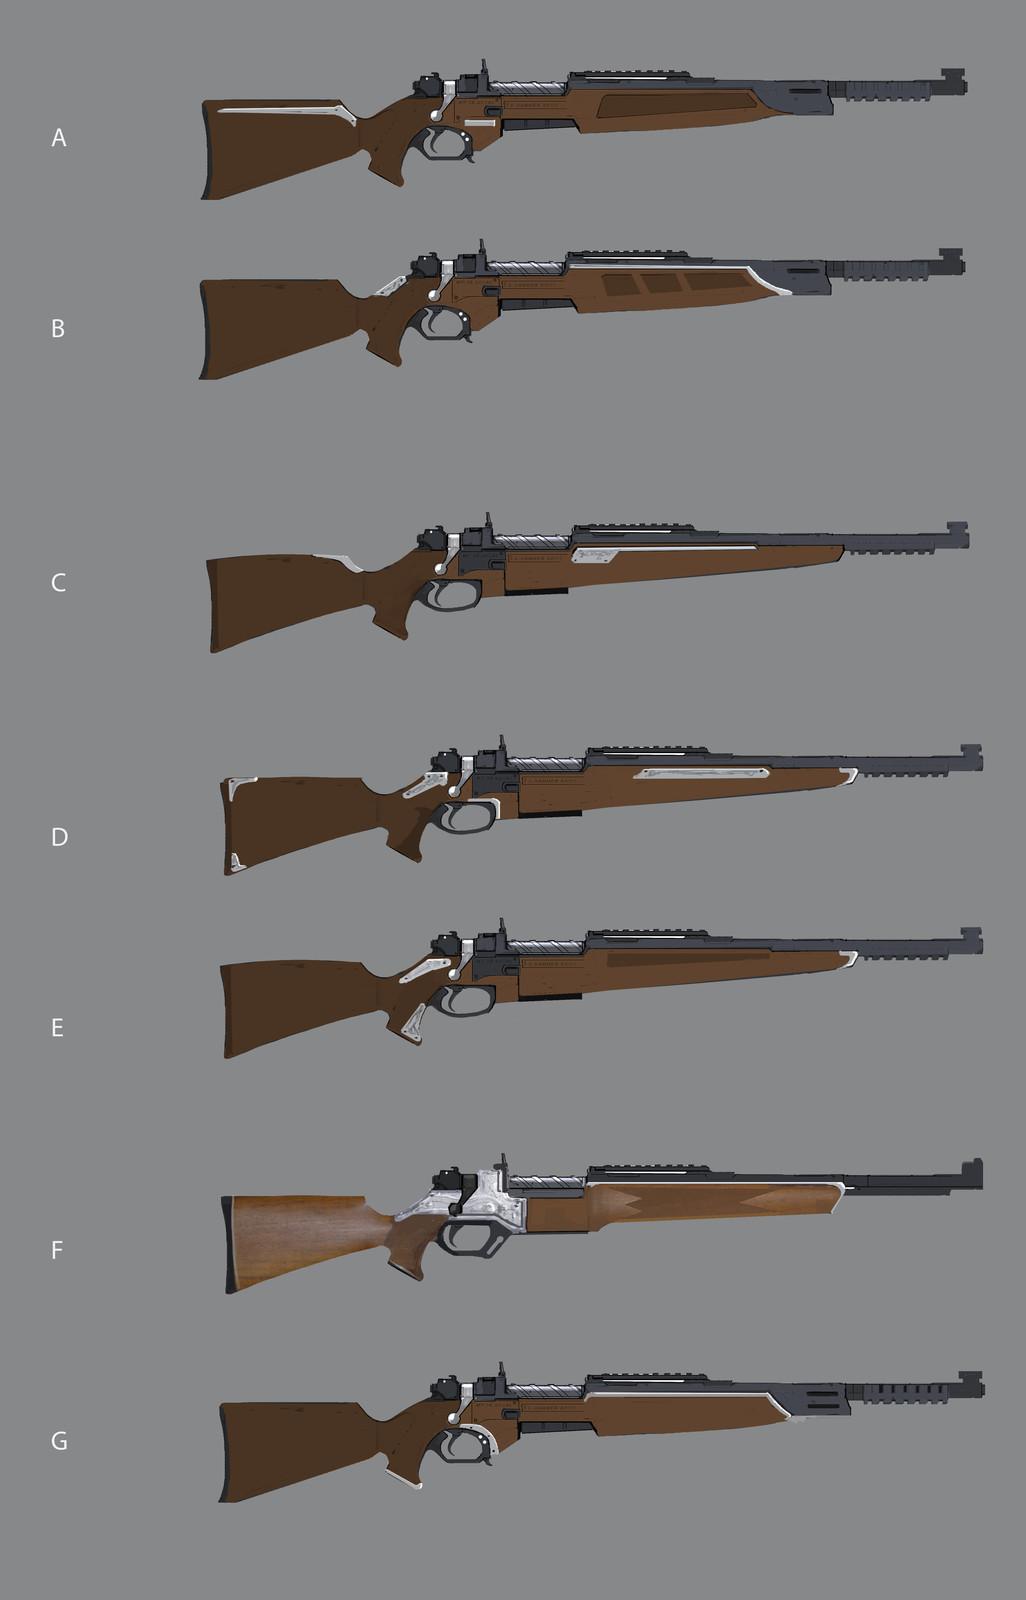 Main character's rifle